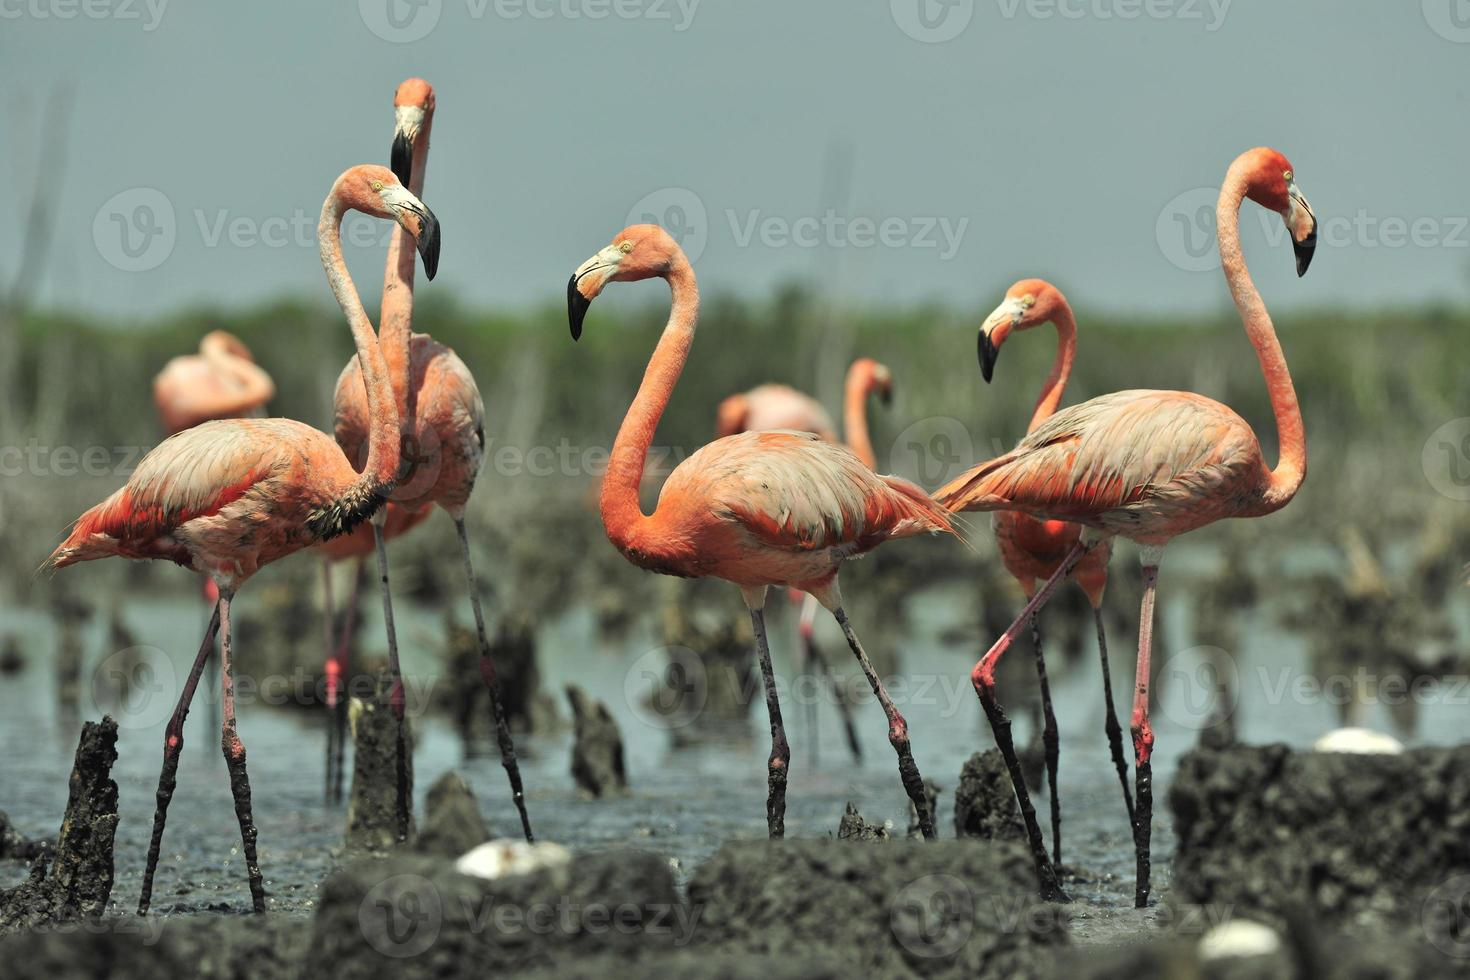 großer Flamingo (phoenicopterus ruber) foto